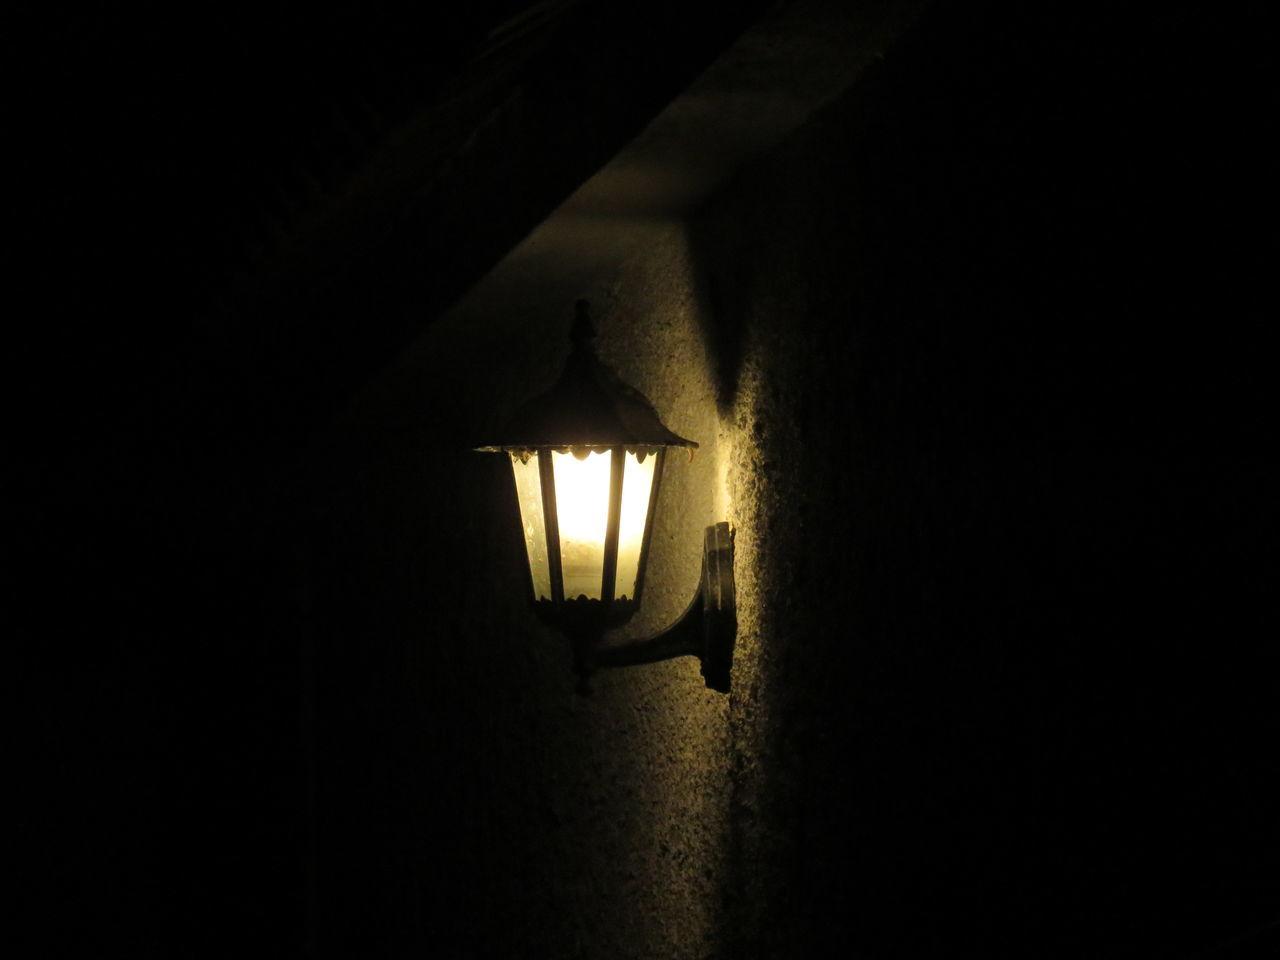 illuminated, lighting equipment, glowing, electricity, indoors, darkroom, no people, dark, night, light bulb, close-up, black background, technology